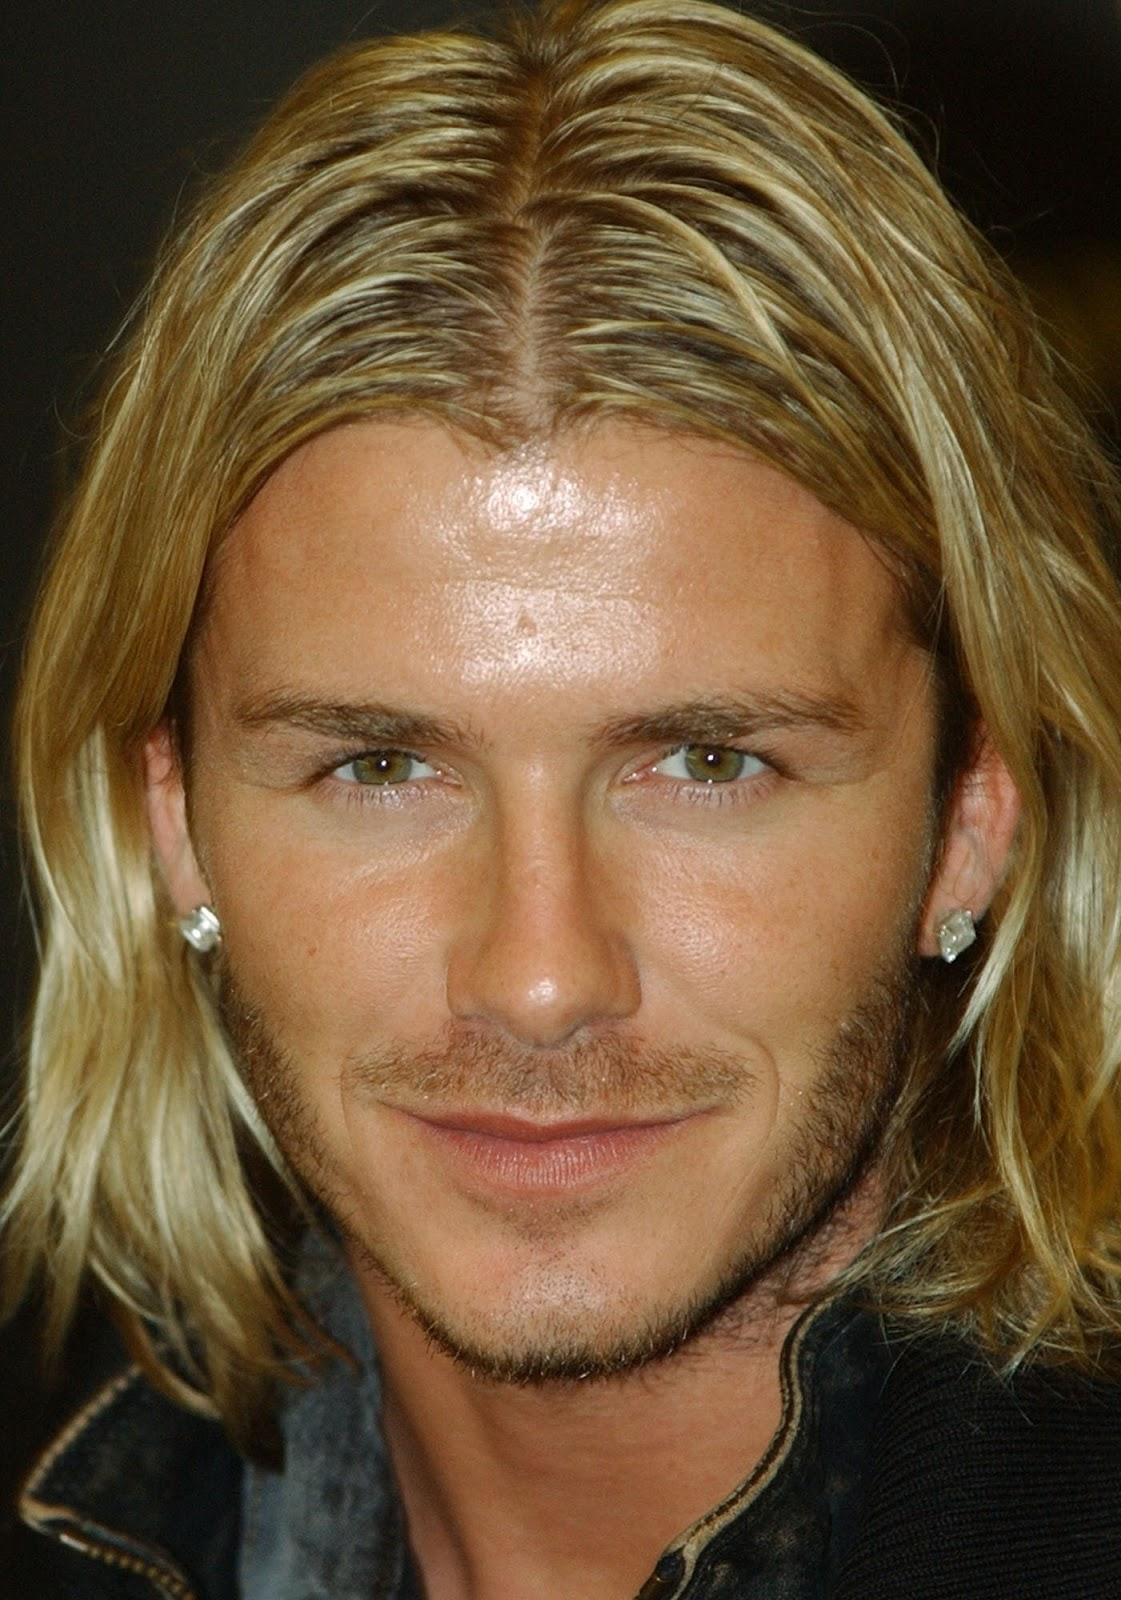 Formas de moda también beckham peinados Fotos de estilo de color de pelo - The Long and Short of Celebrity Hairstyles: David Beckham ...